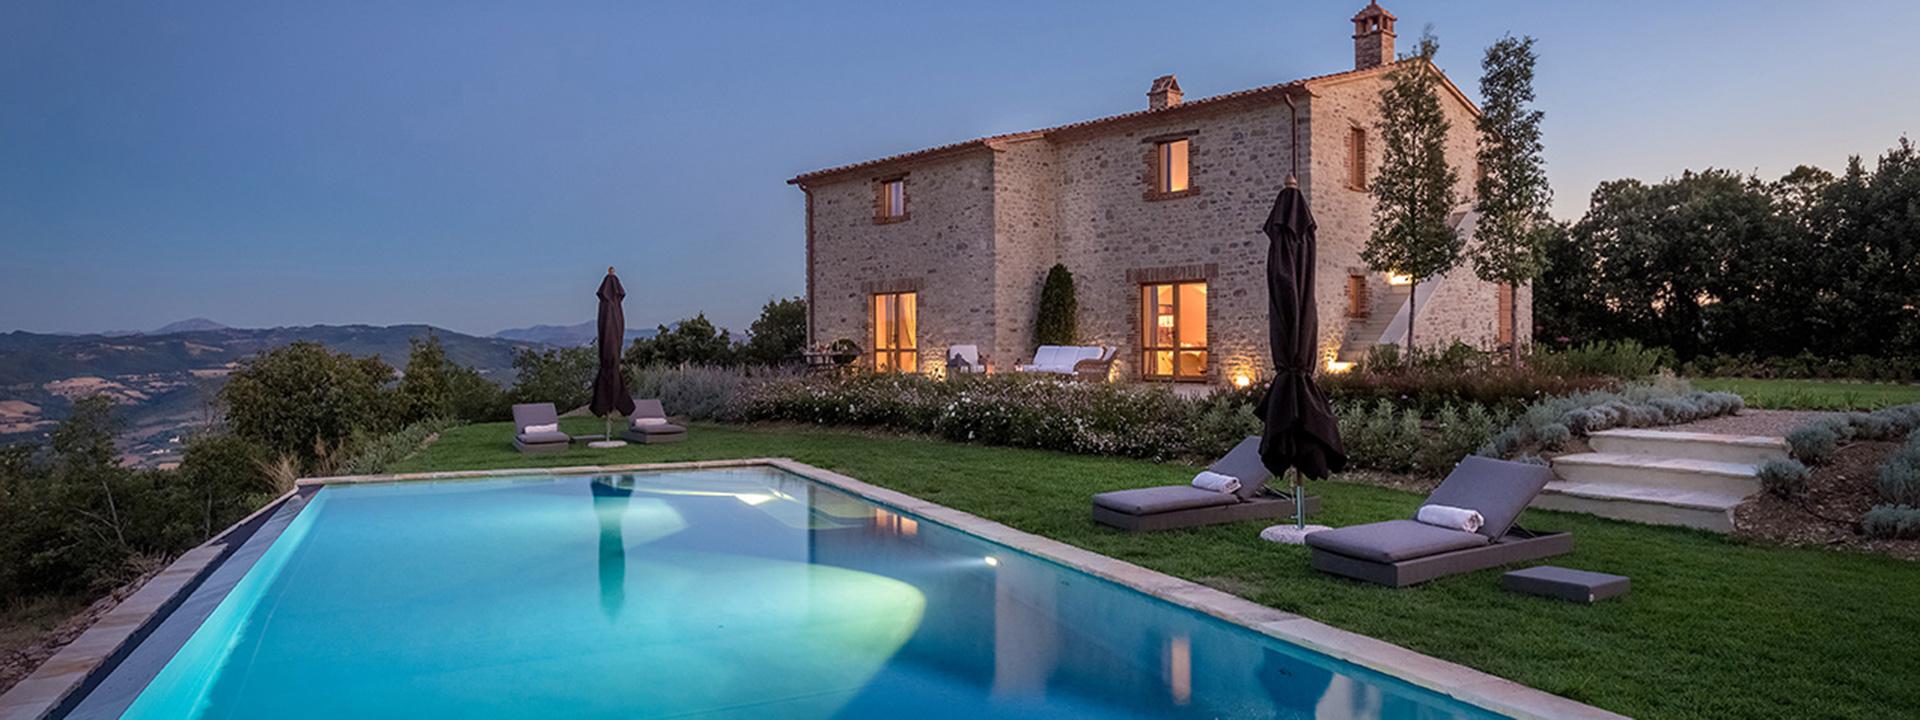 Landhäuser in der Toskan,Ubrien,Marken